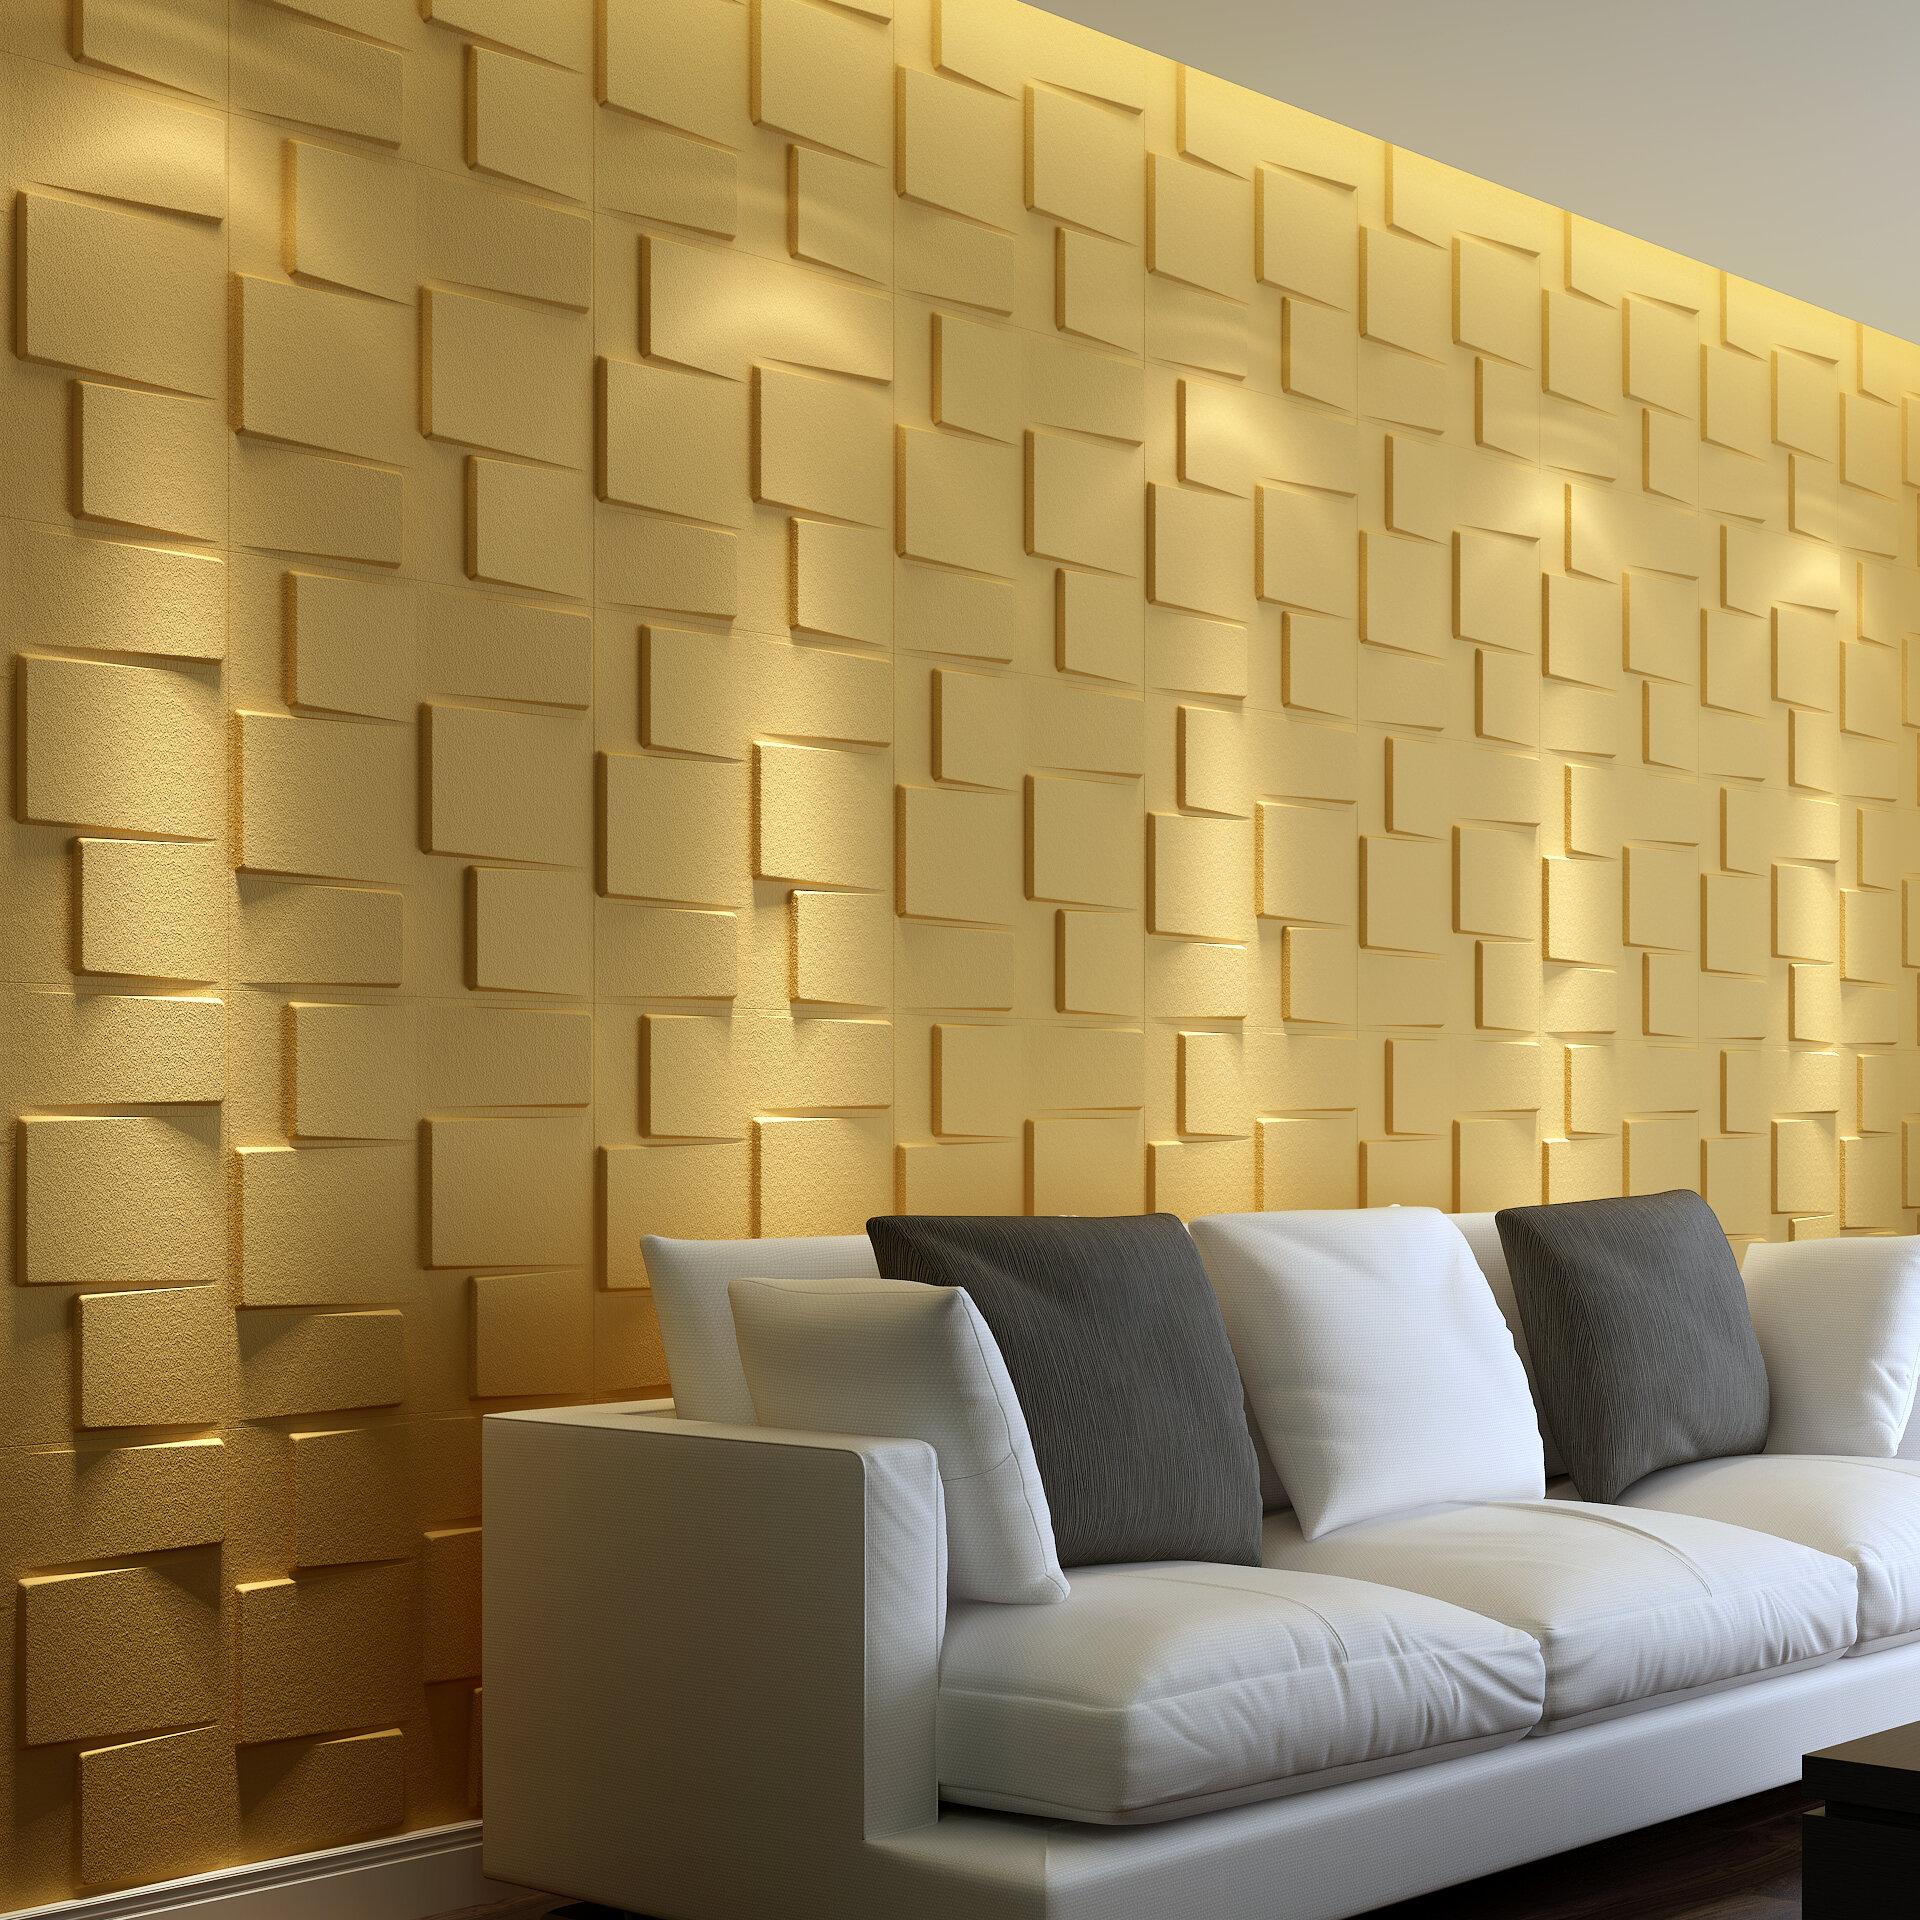 Threedwall 235 2 X 19 6 Blocks Brick 3d Embossed Plant Fibres Wall Paneling Off White Reviews Wayfair